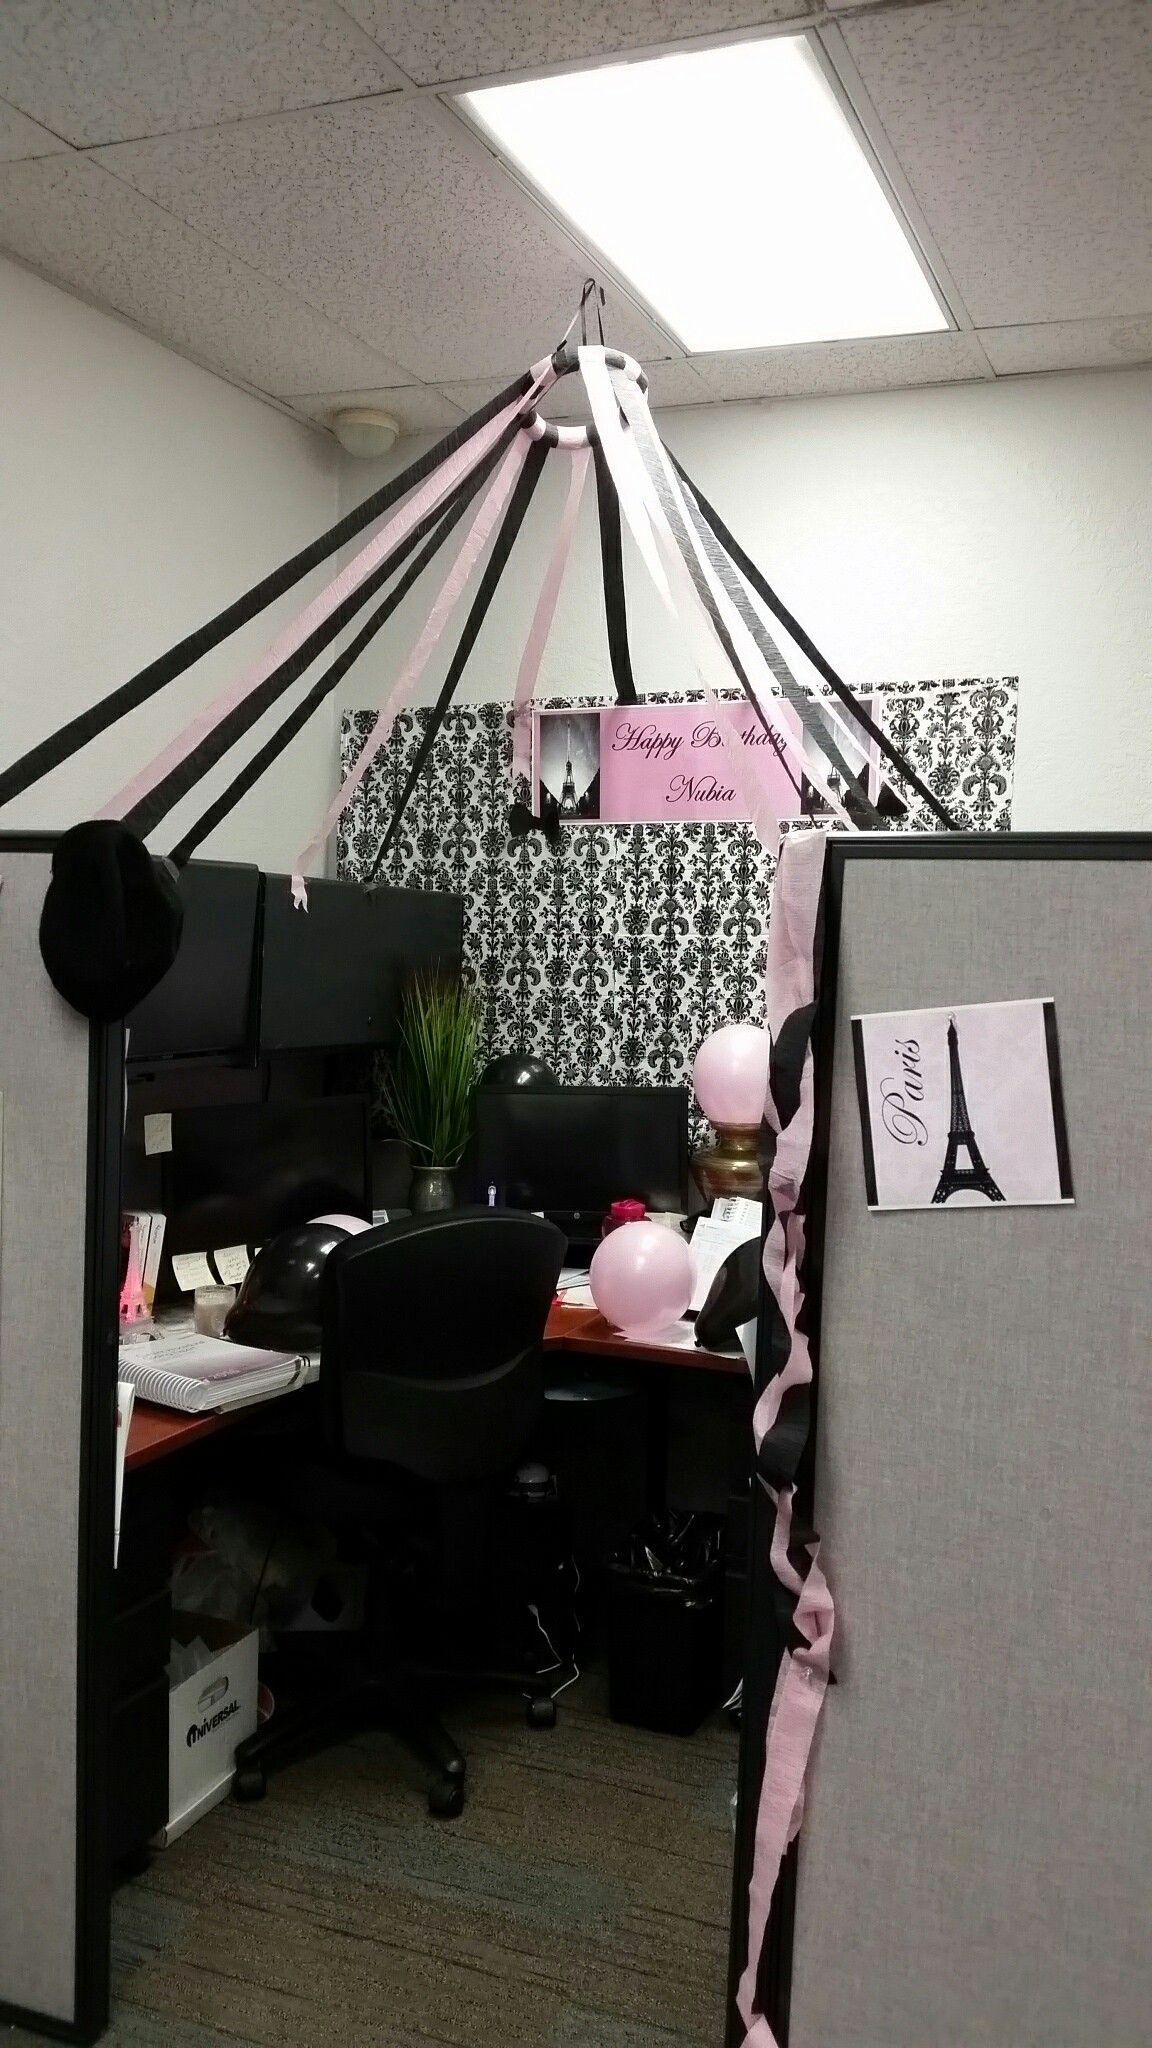 Birthday Cubicle Decoration Ideas Also Best Office Images Shark Rh Maria Olvera Molvera